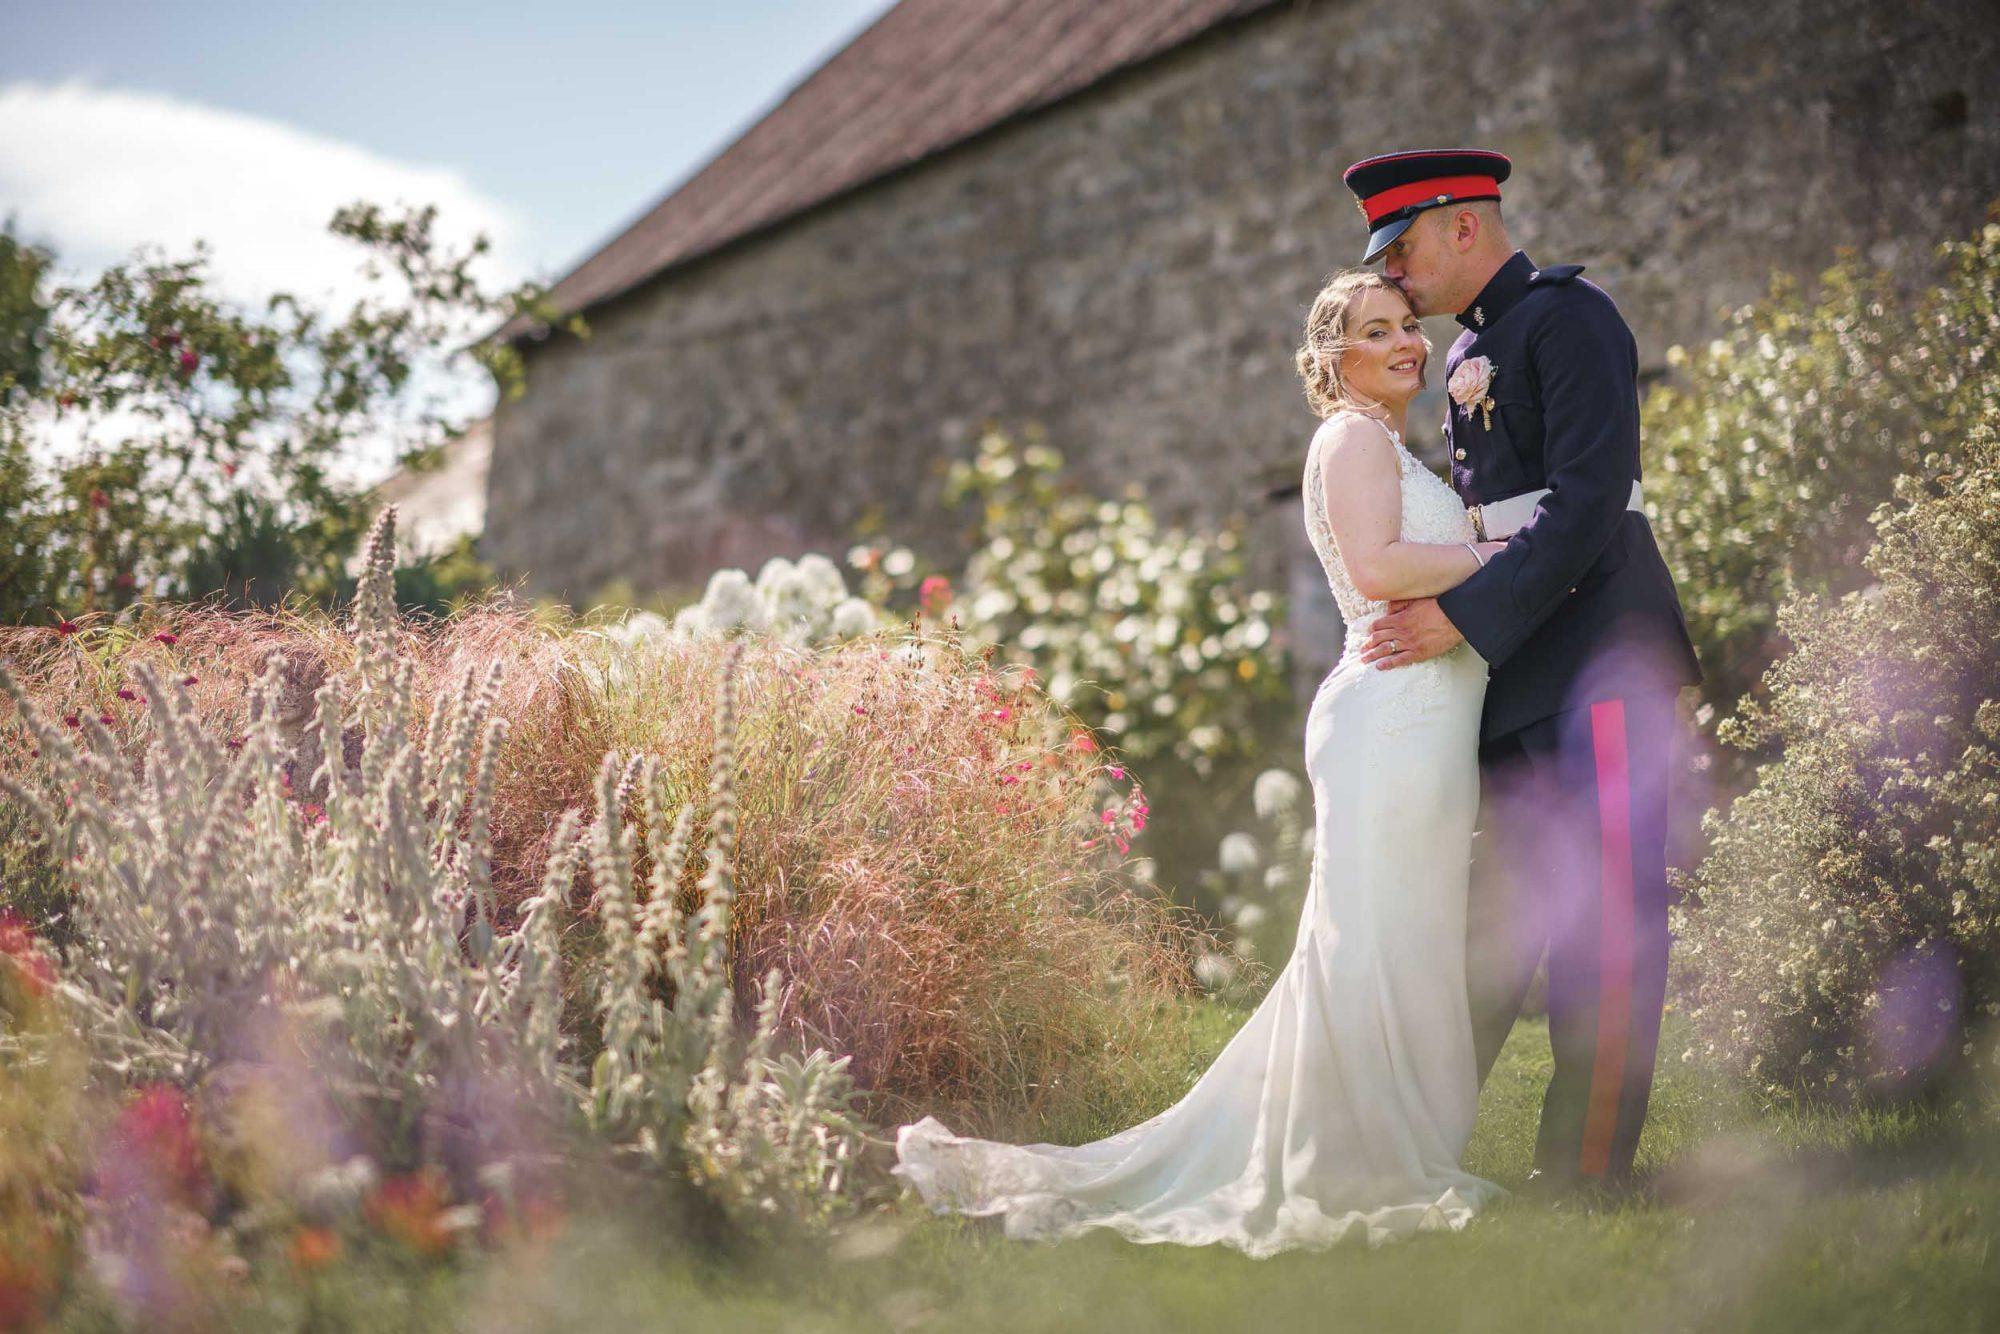 Upcote Barn Wedding Photography, Cotswolds wedding photographer, Wedding, Upcote Barn, Cotswolds, Photographer